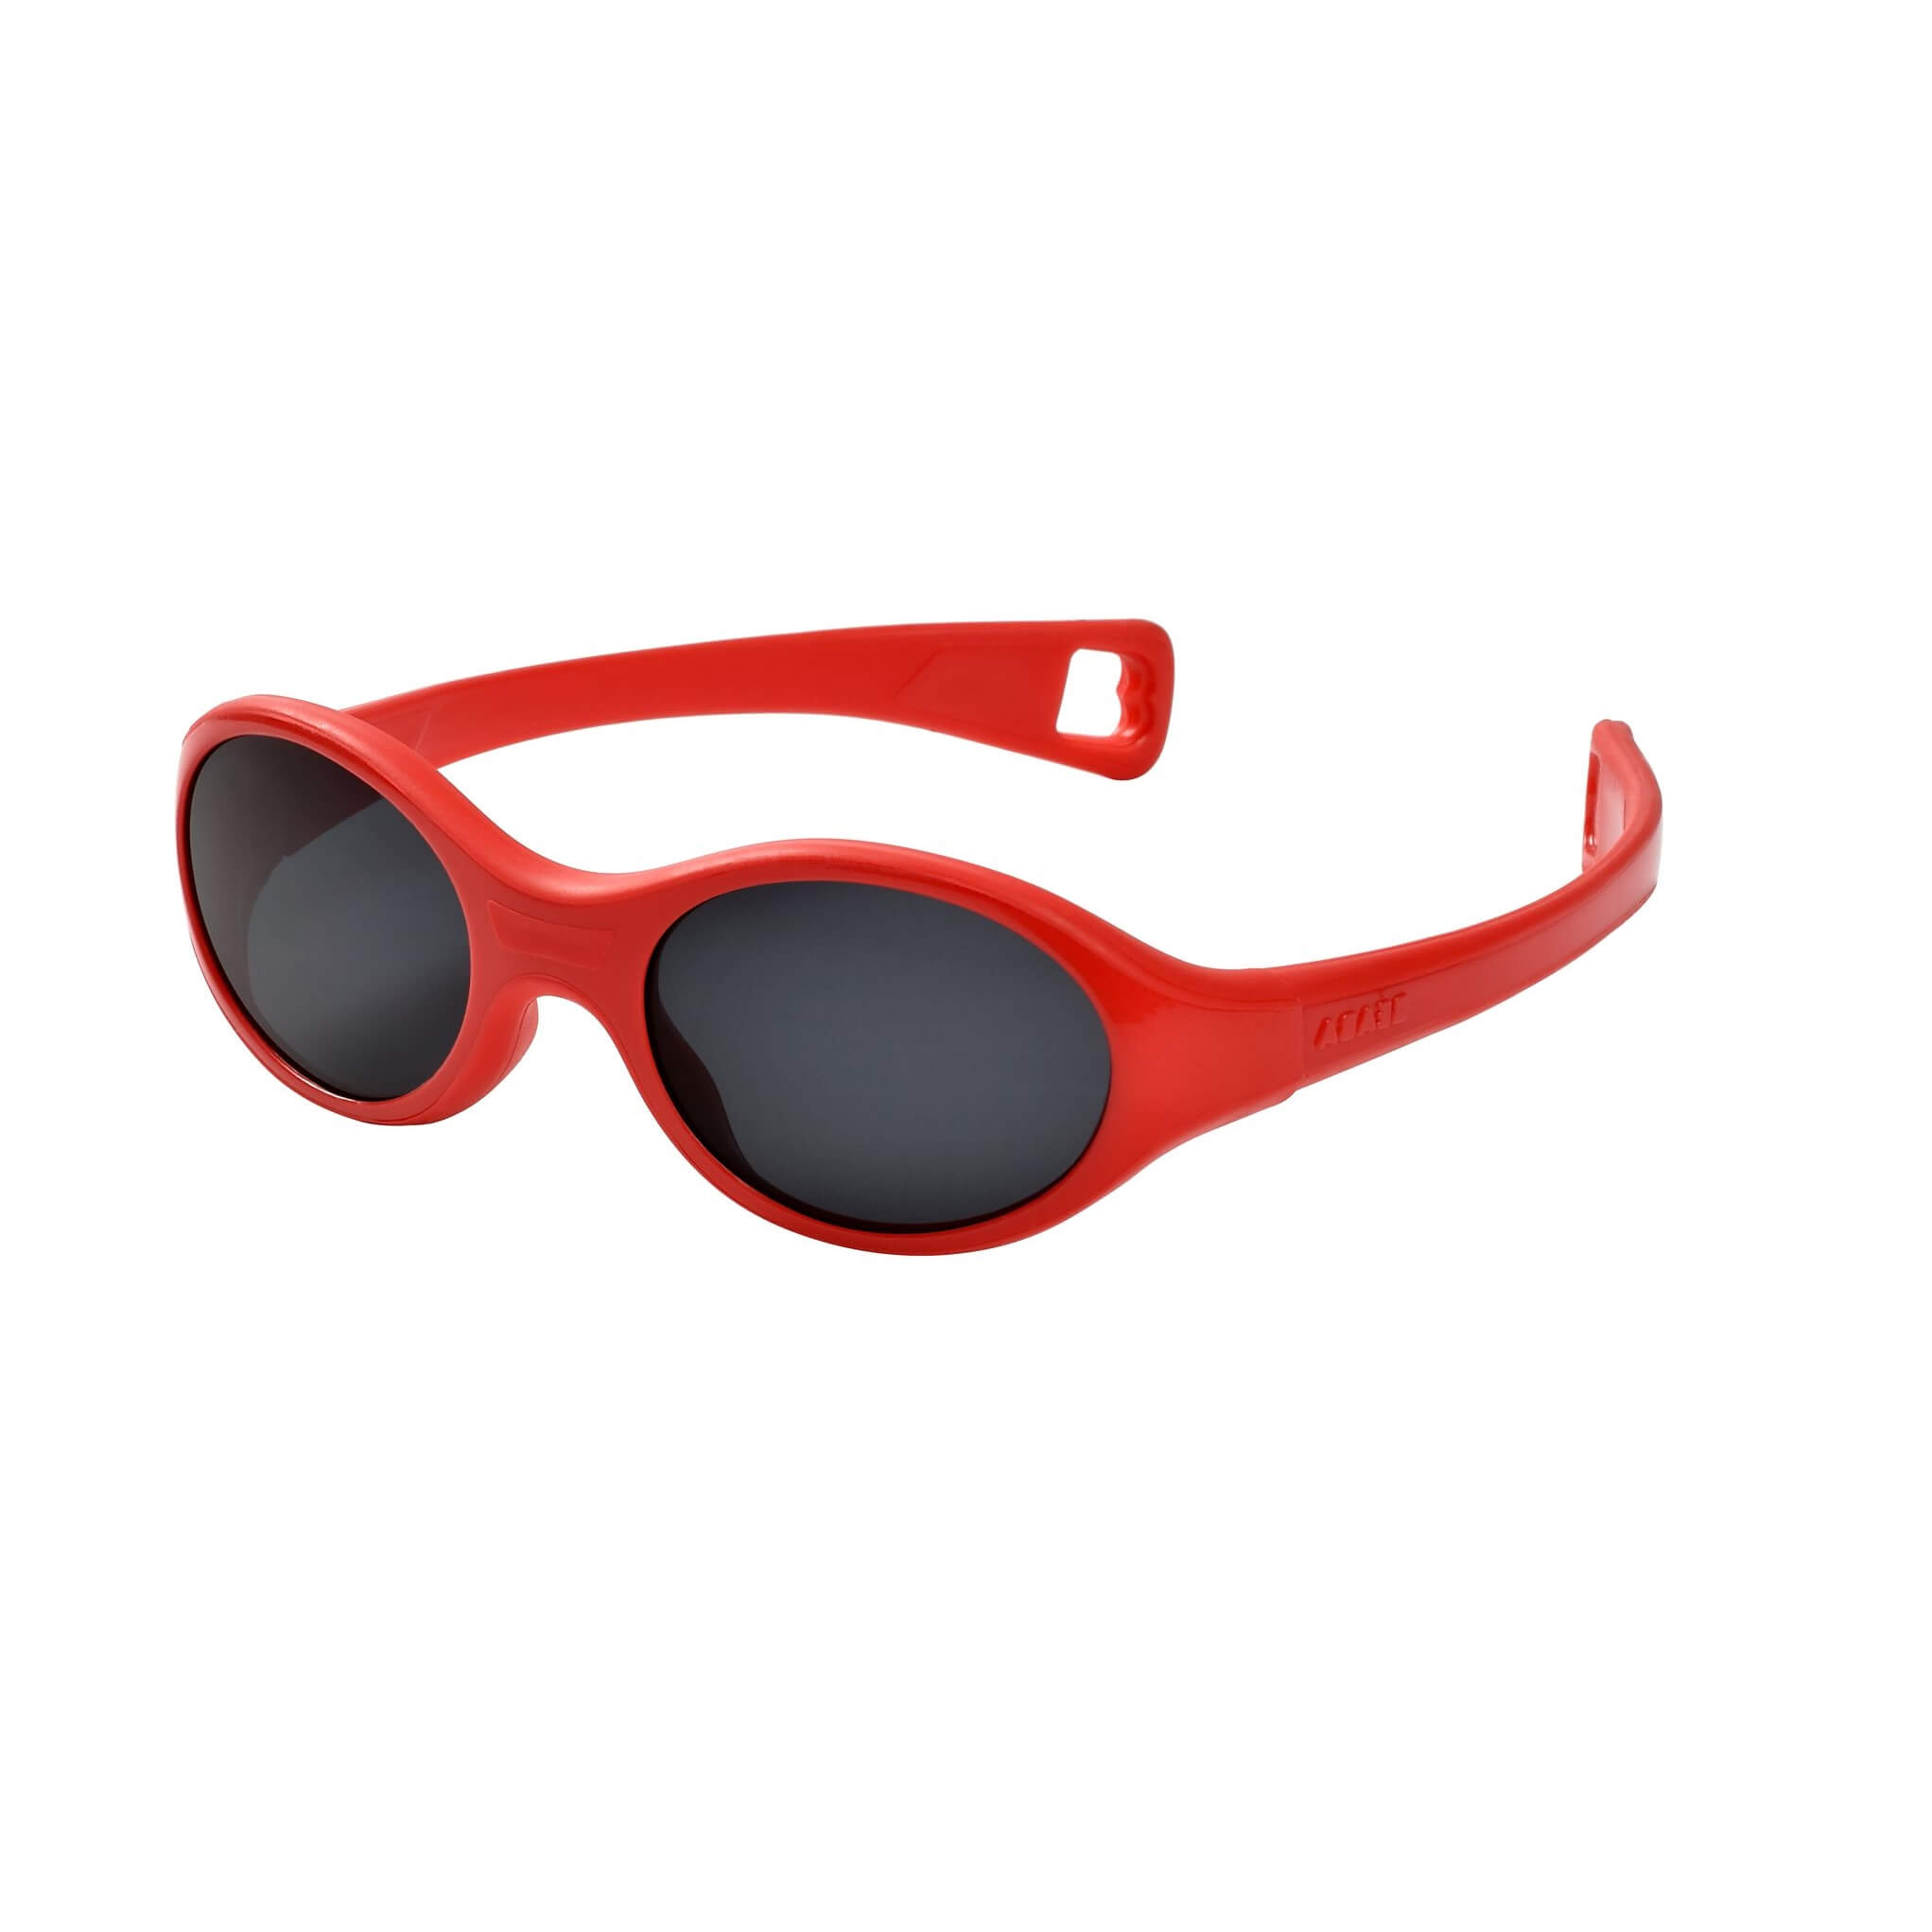 a700b2226ff160 Beaba Lunettes de soleil Kids M Poppy red - Made In Bébé